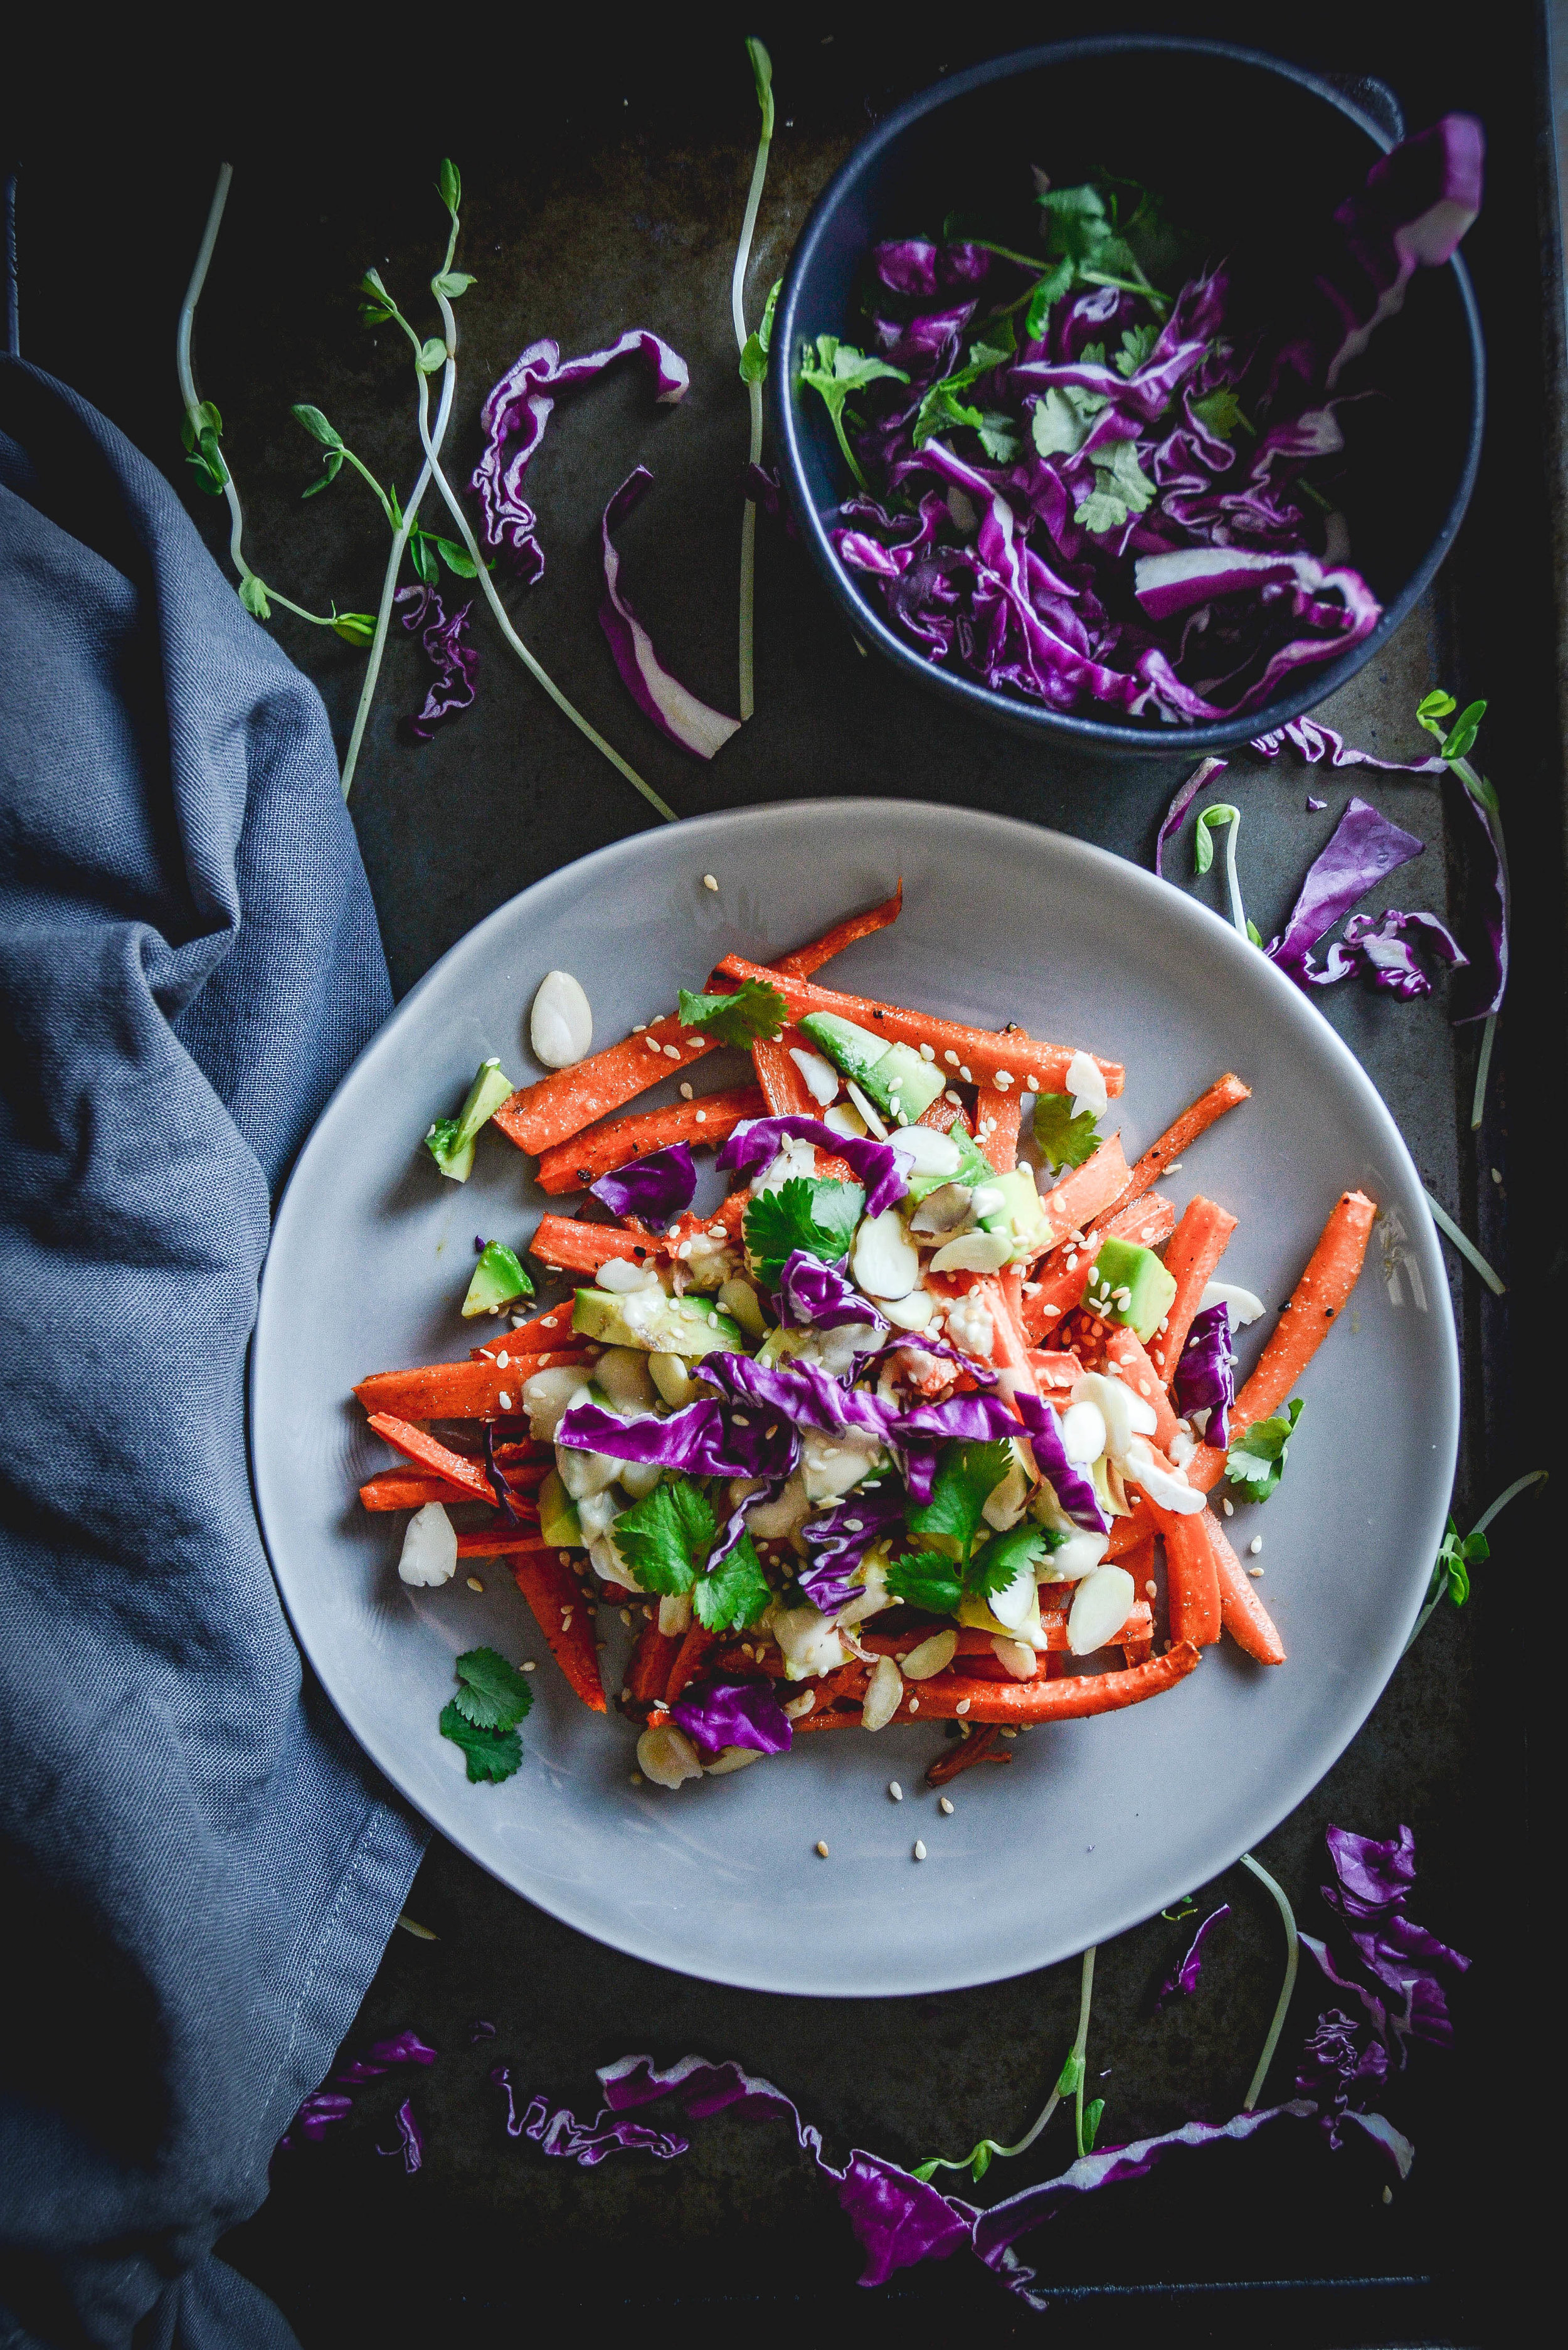 Cumin roasted carrots with avocado, tahini dressing and sesame seeds